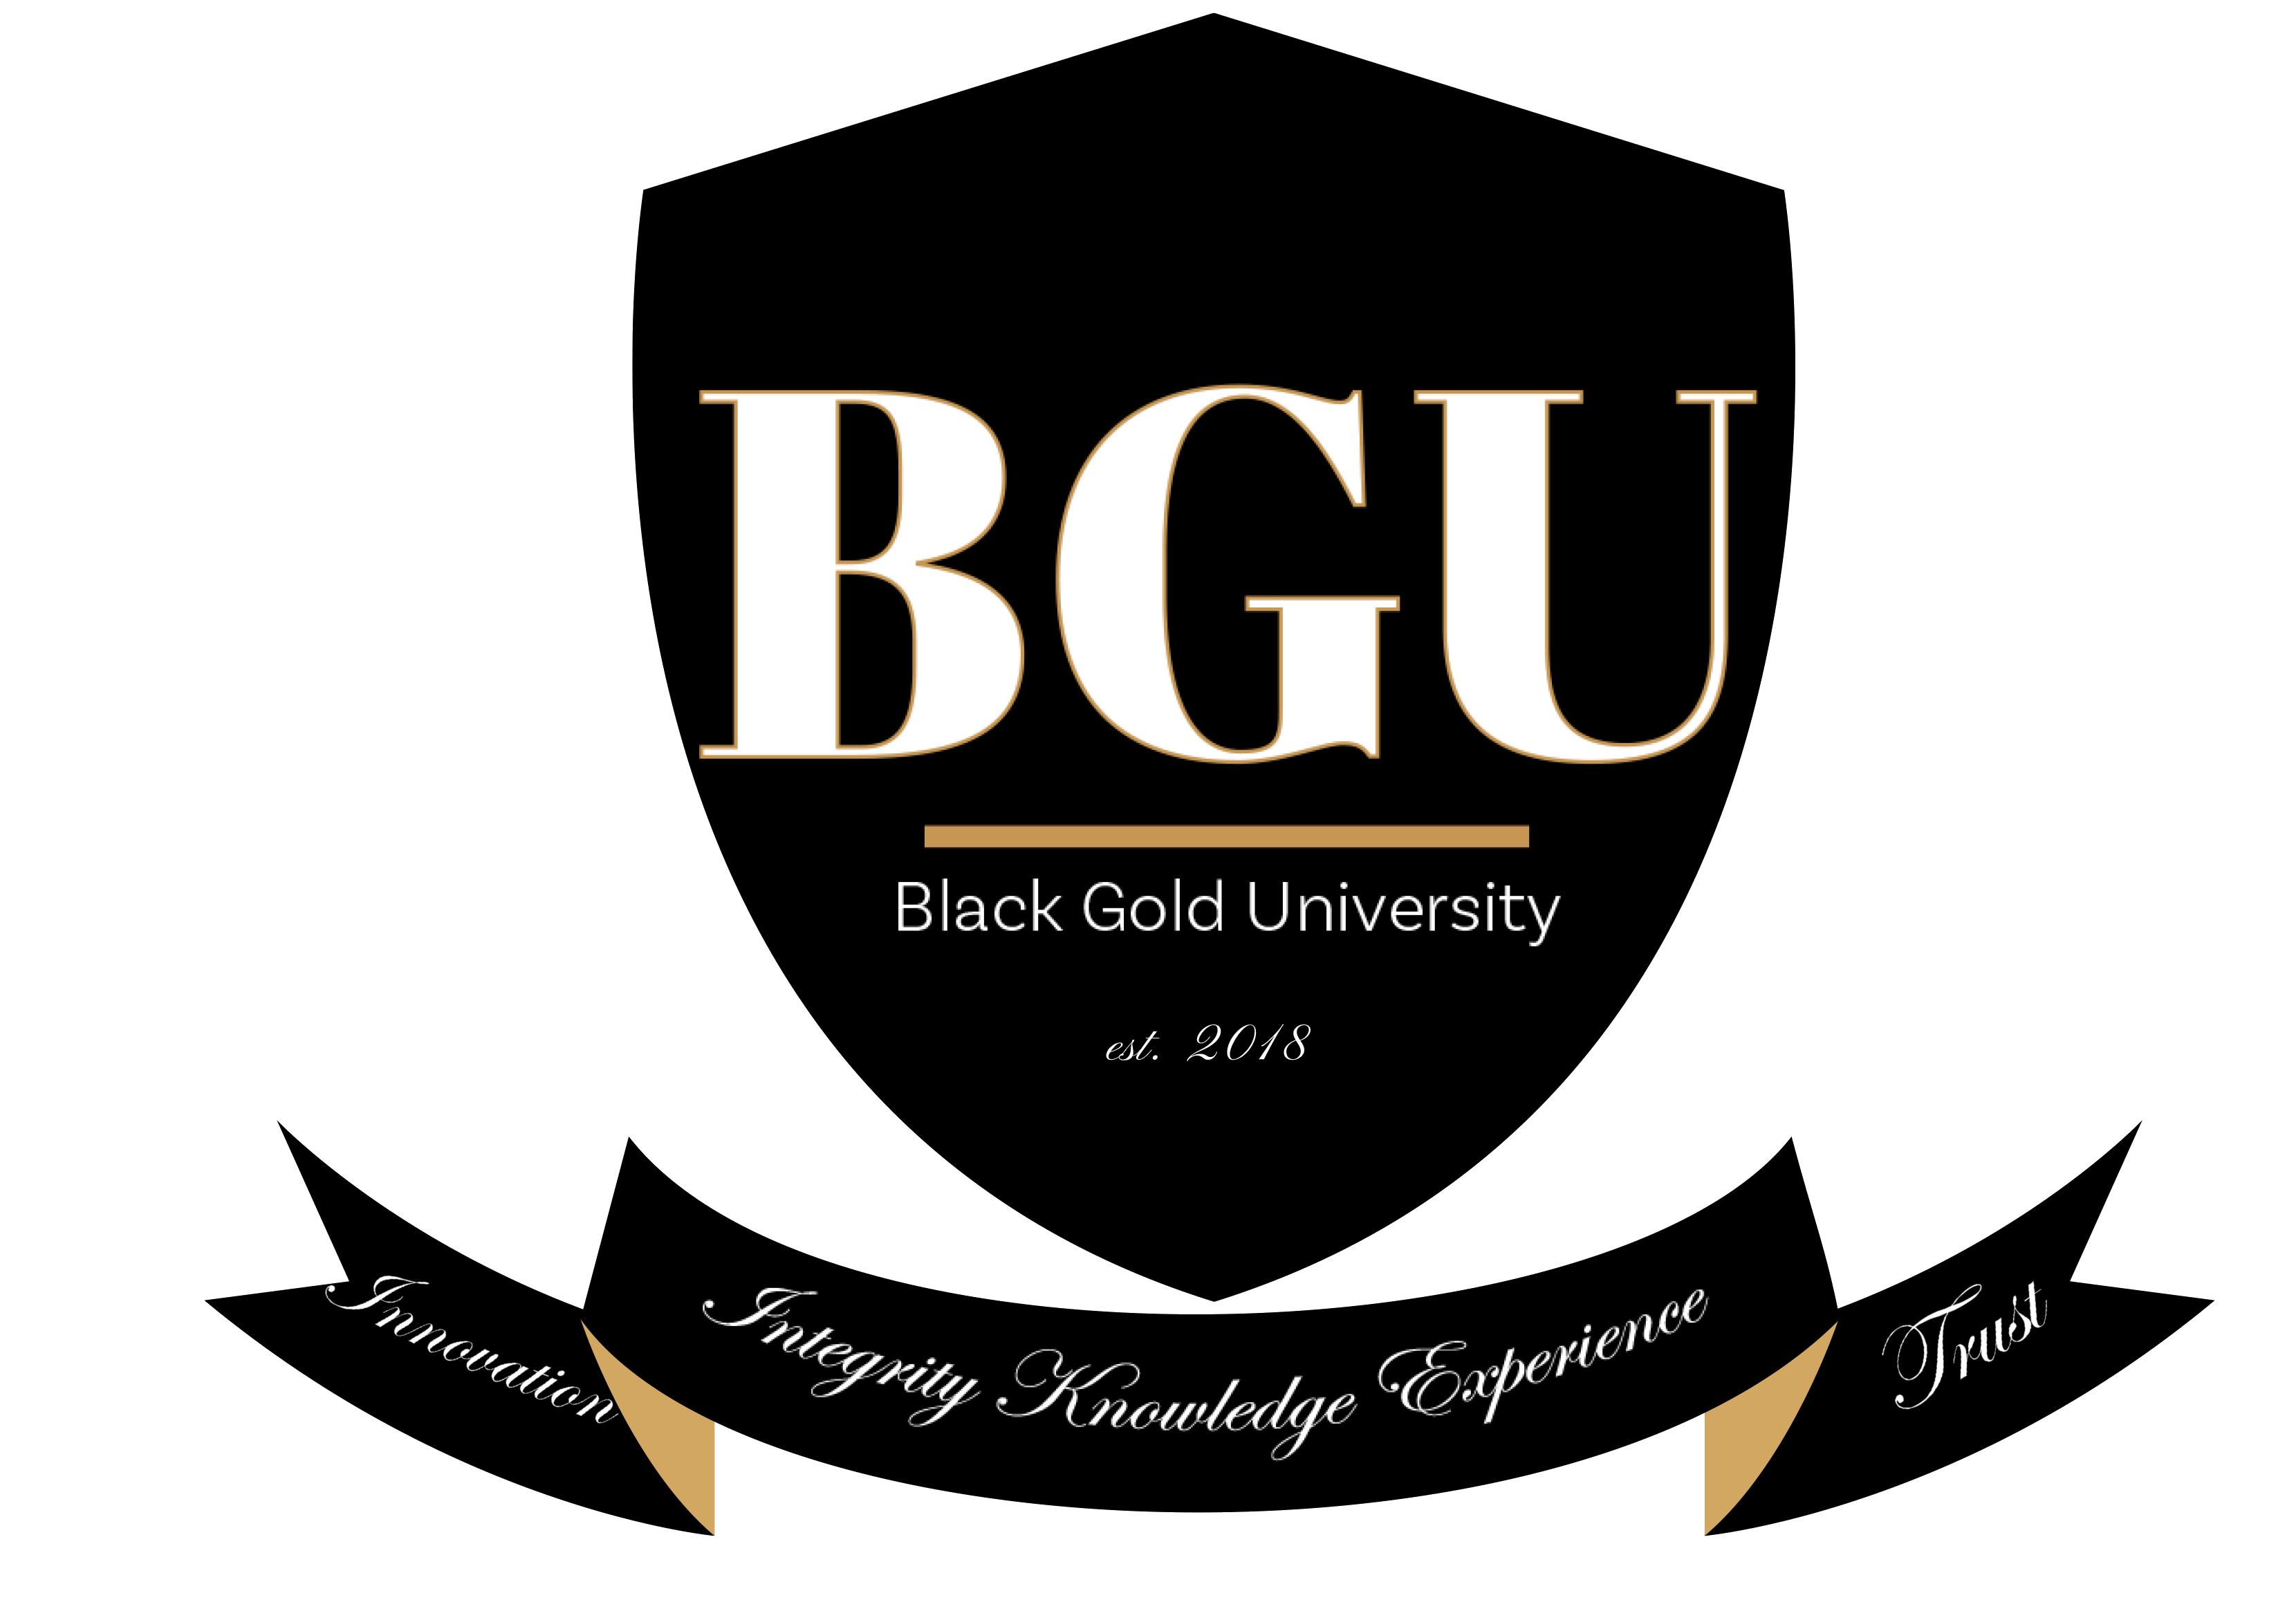 bgu-black-gold-university-crest